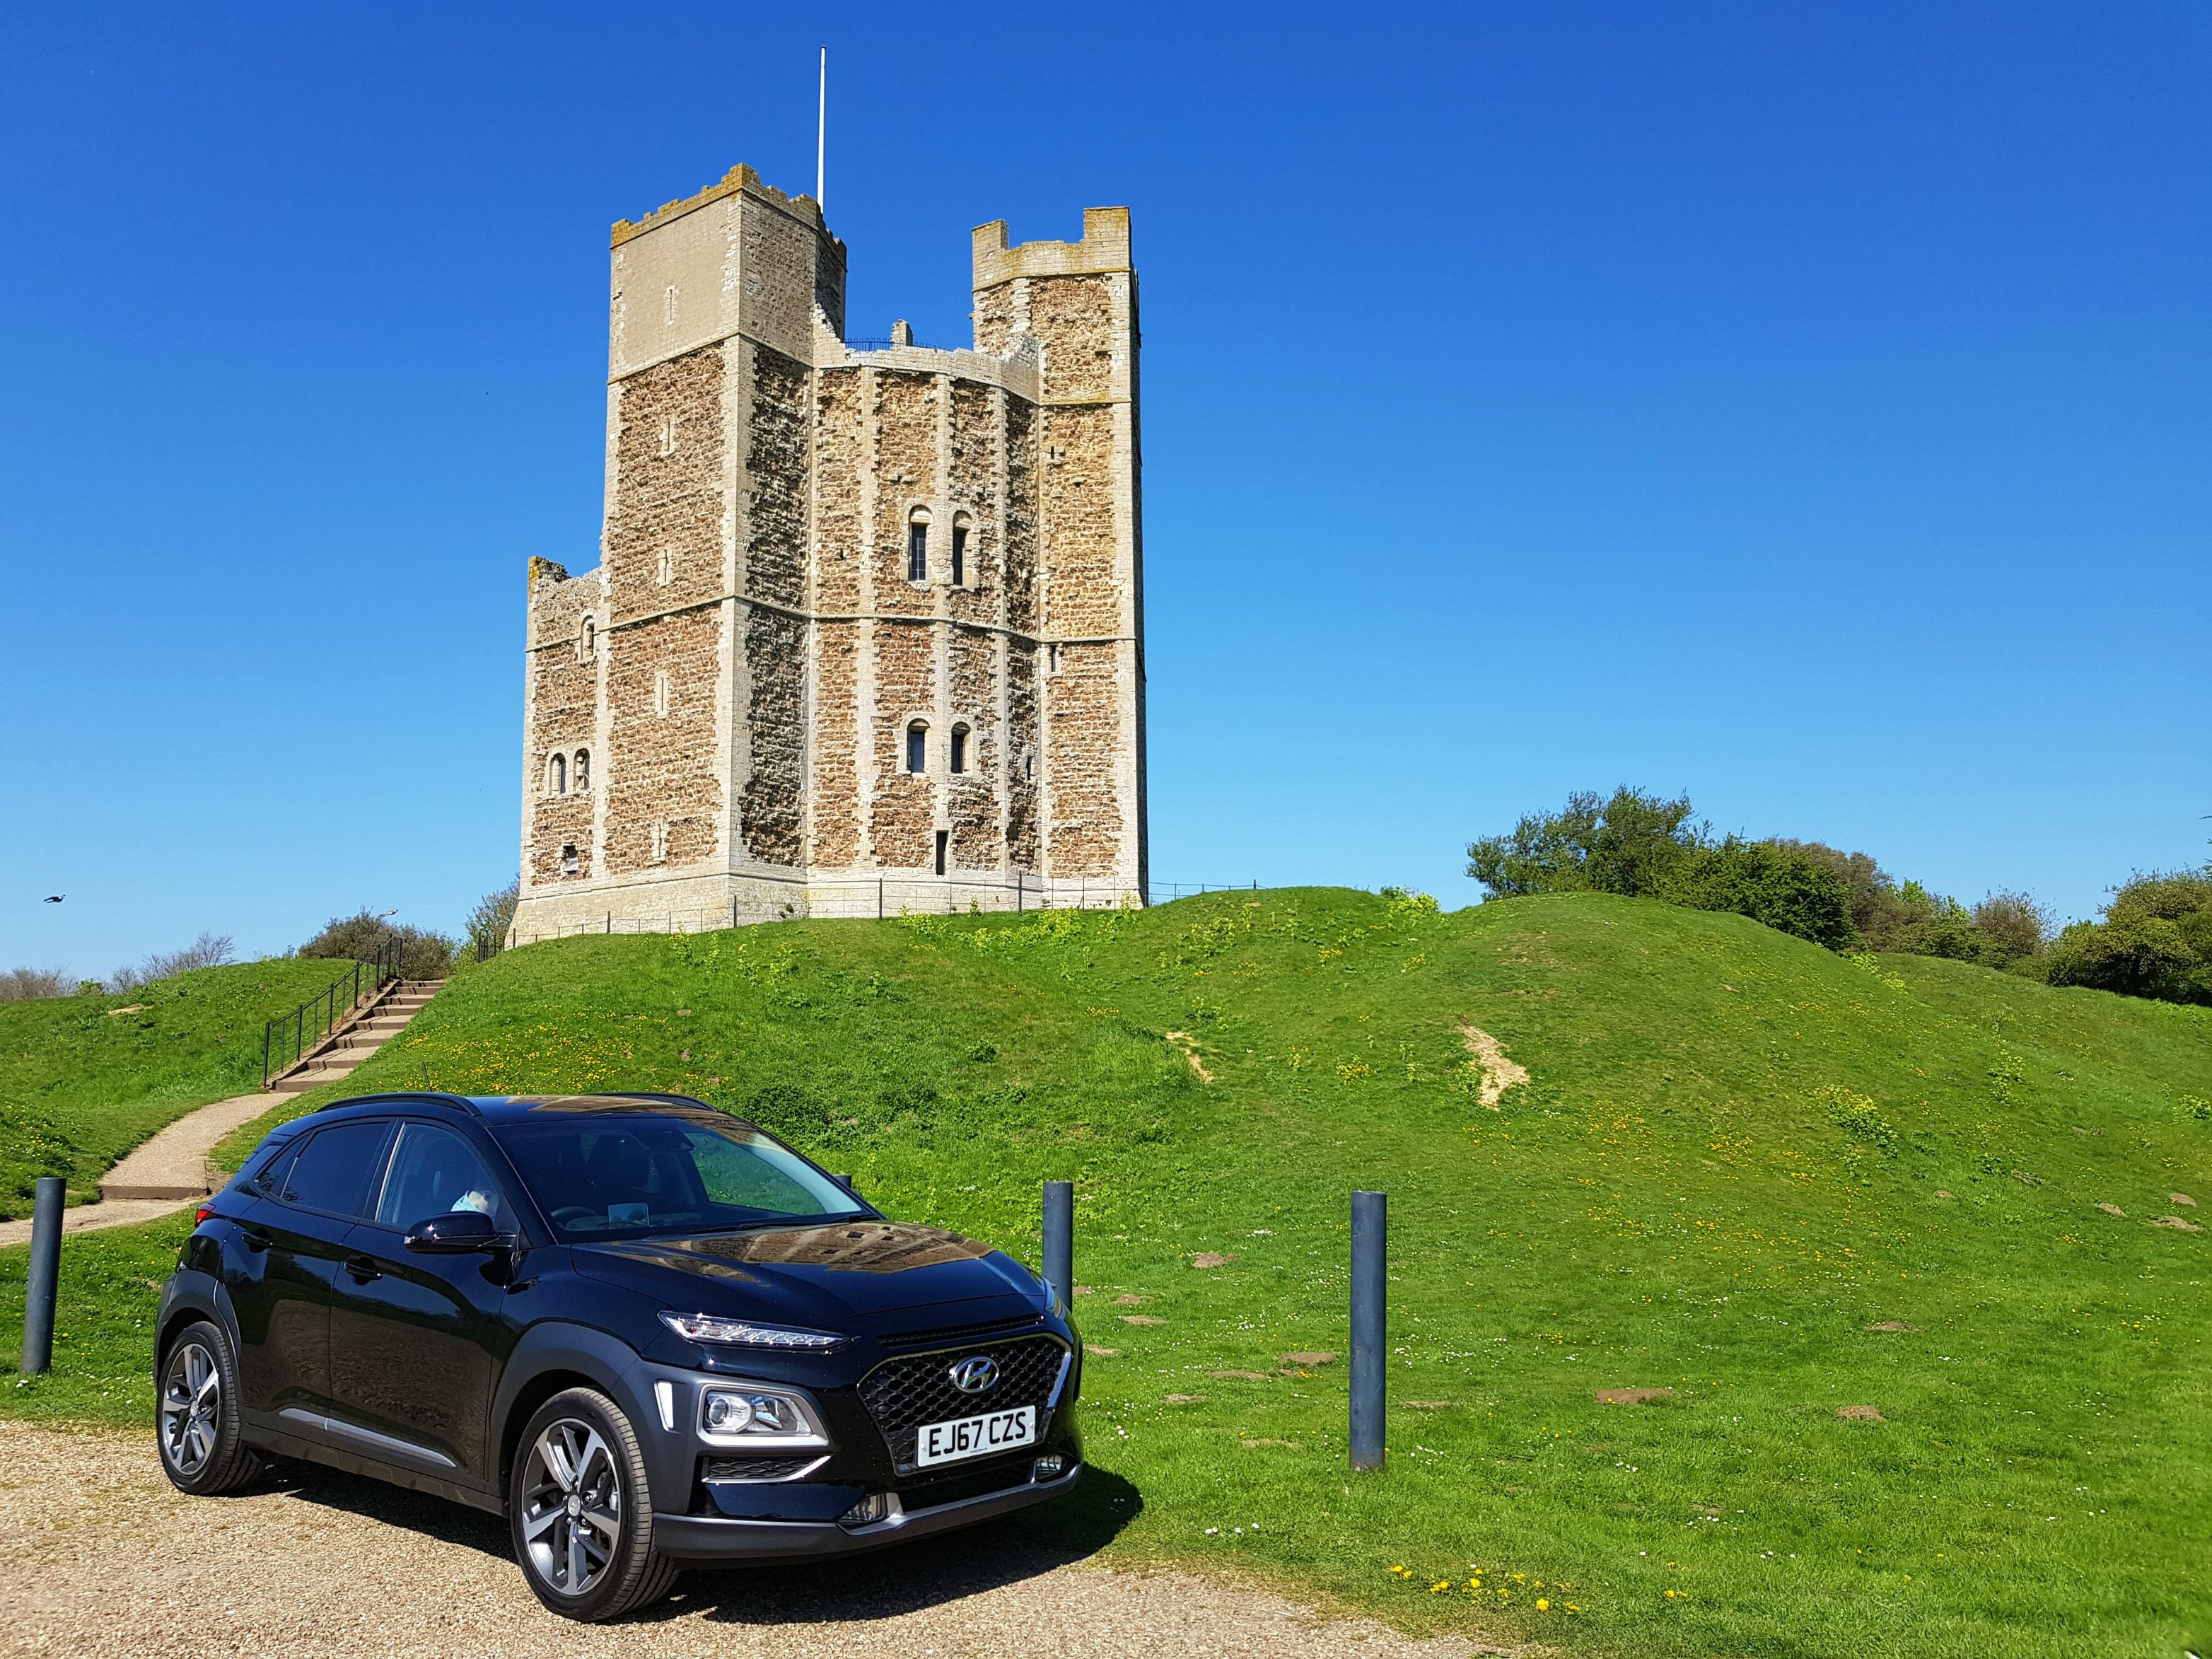 East Anglia family road trip – through history